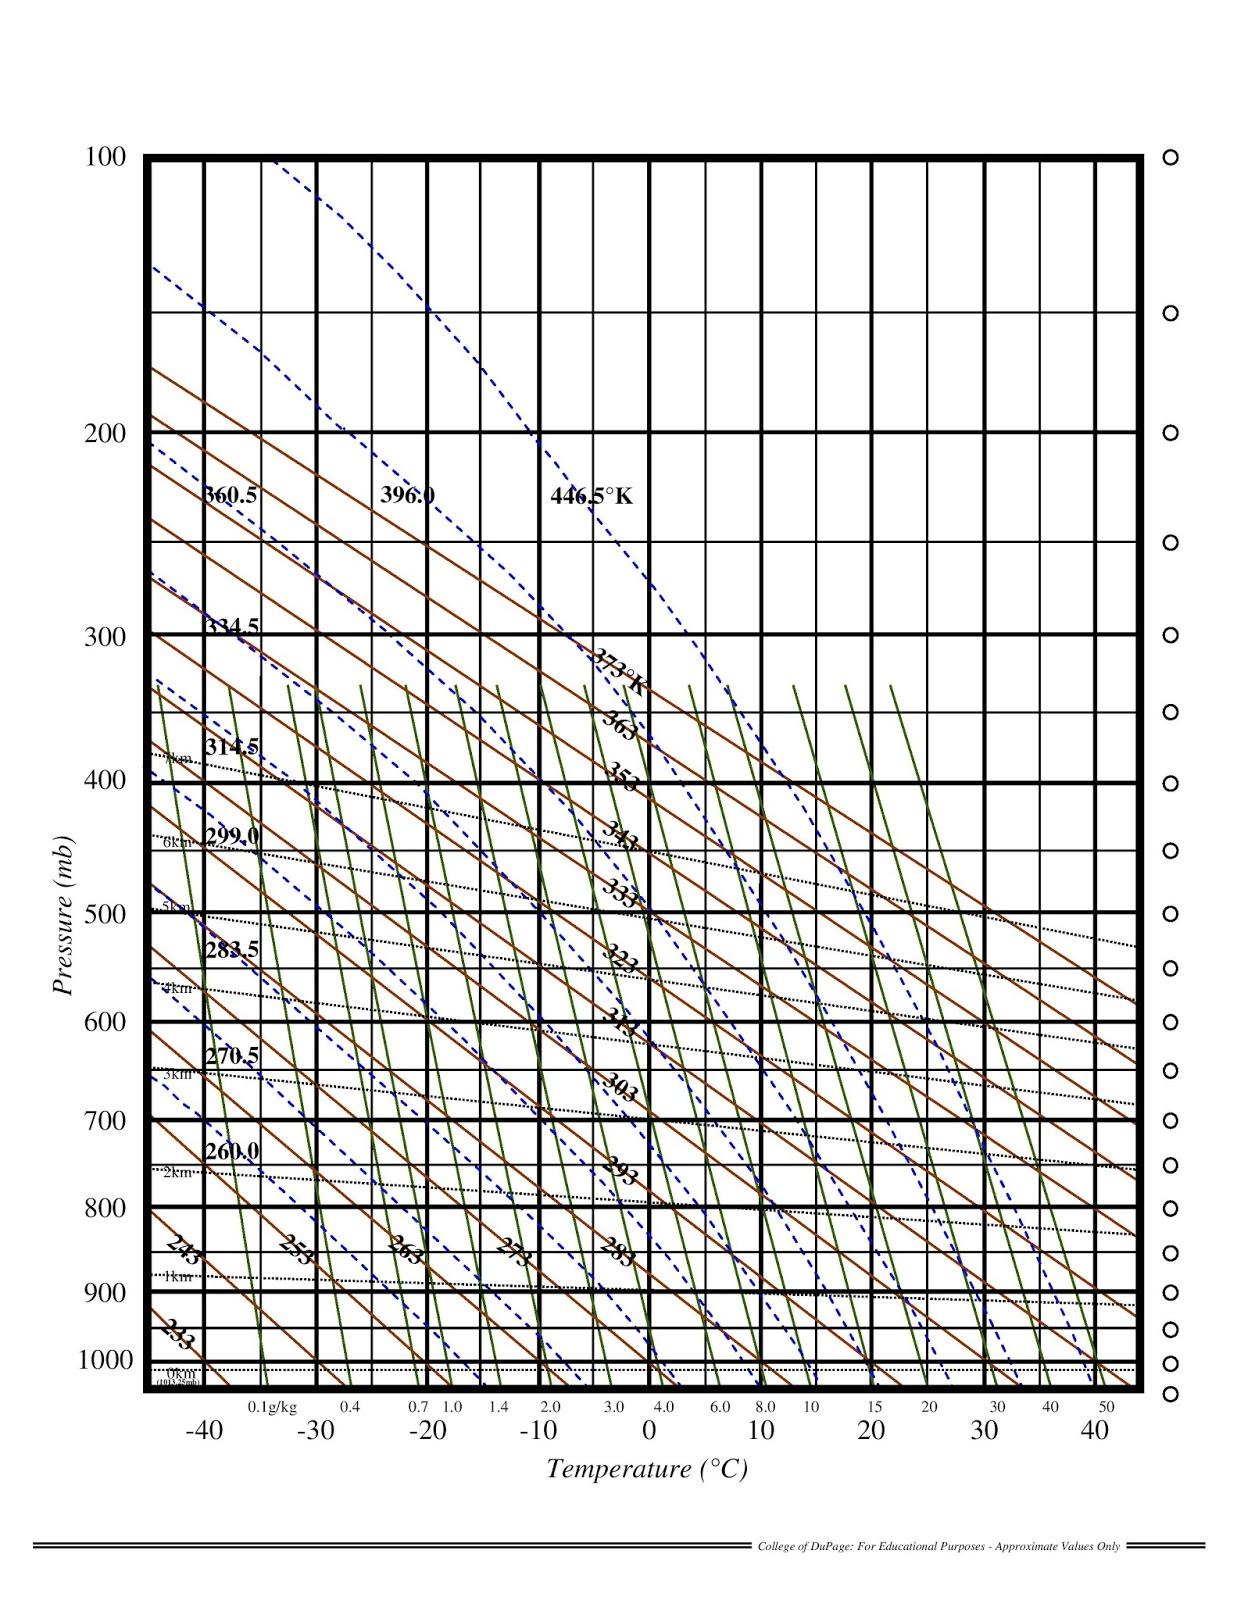 Brandi s Buzzar Blog     Thermodynamic       Diagrams     SkewT LogP